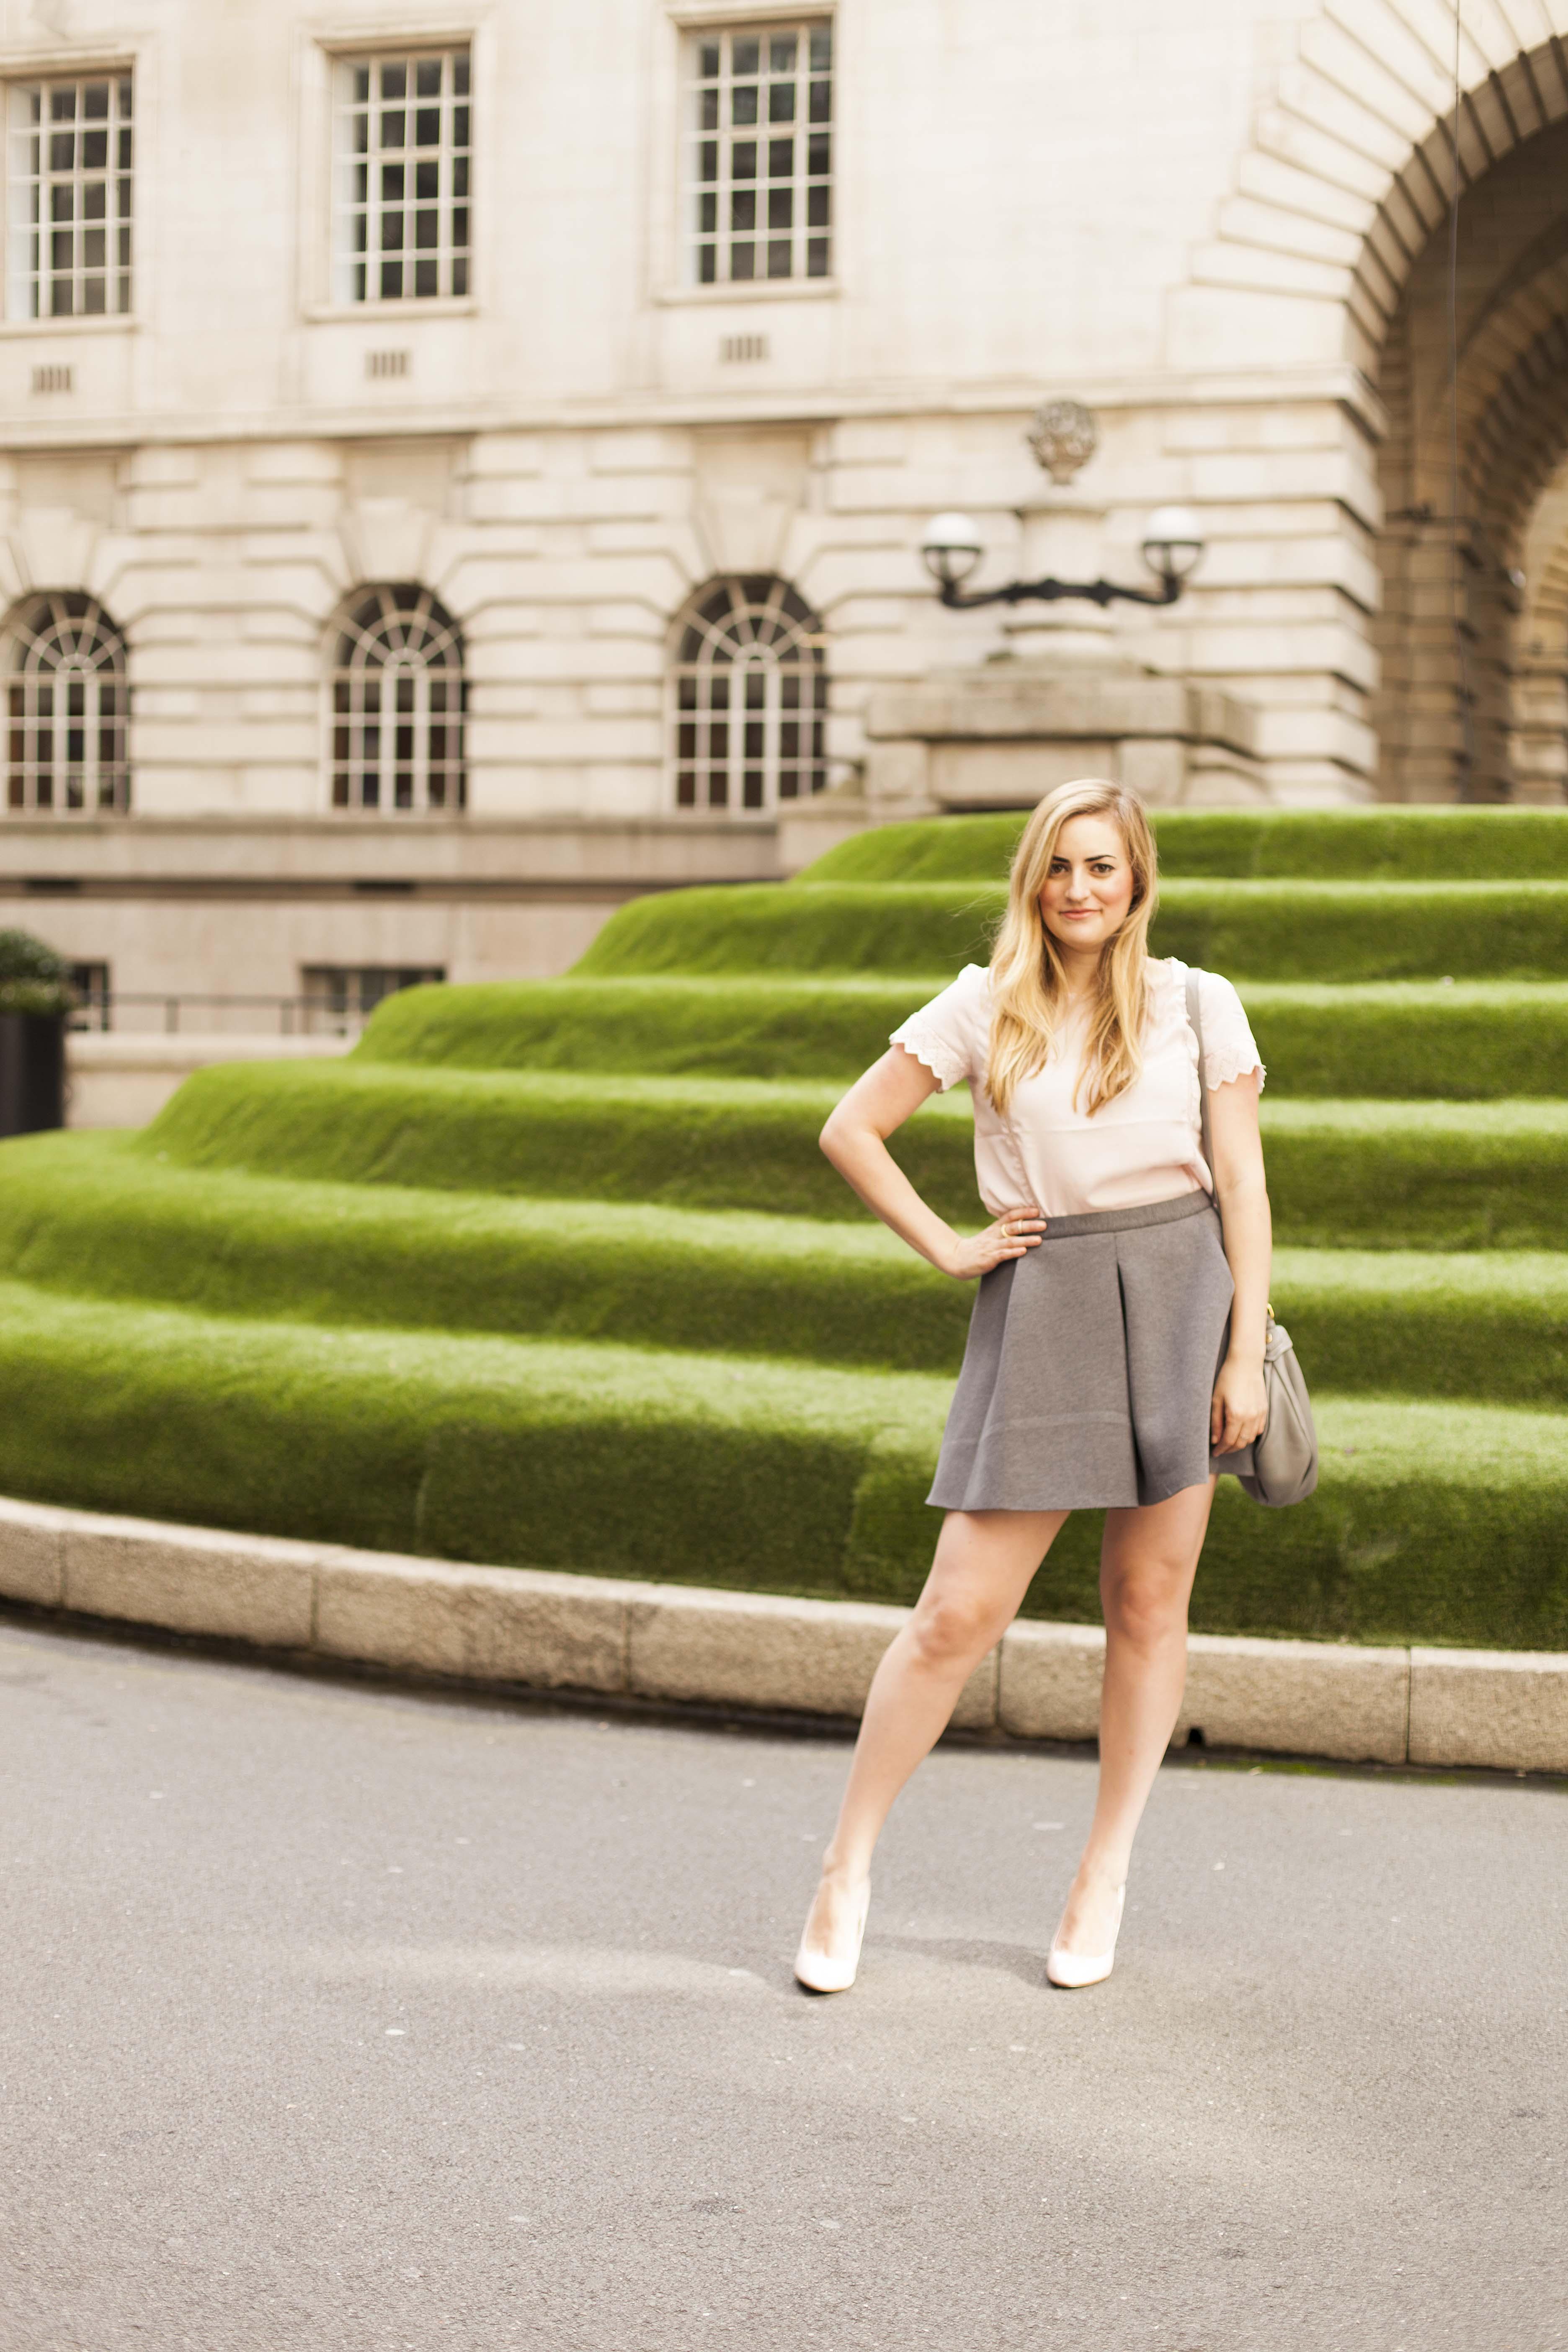 London Reigns Nude Photos 52